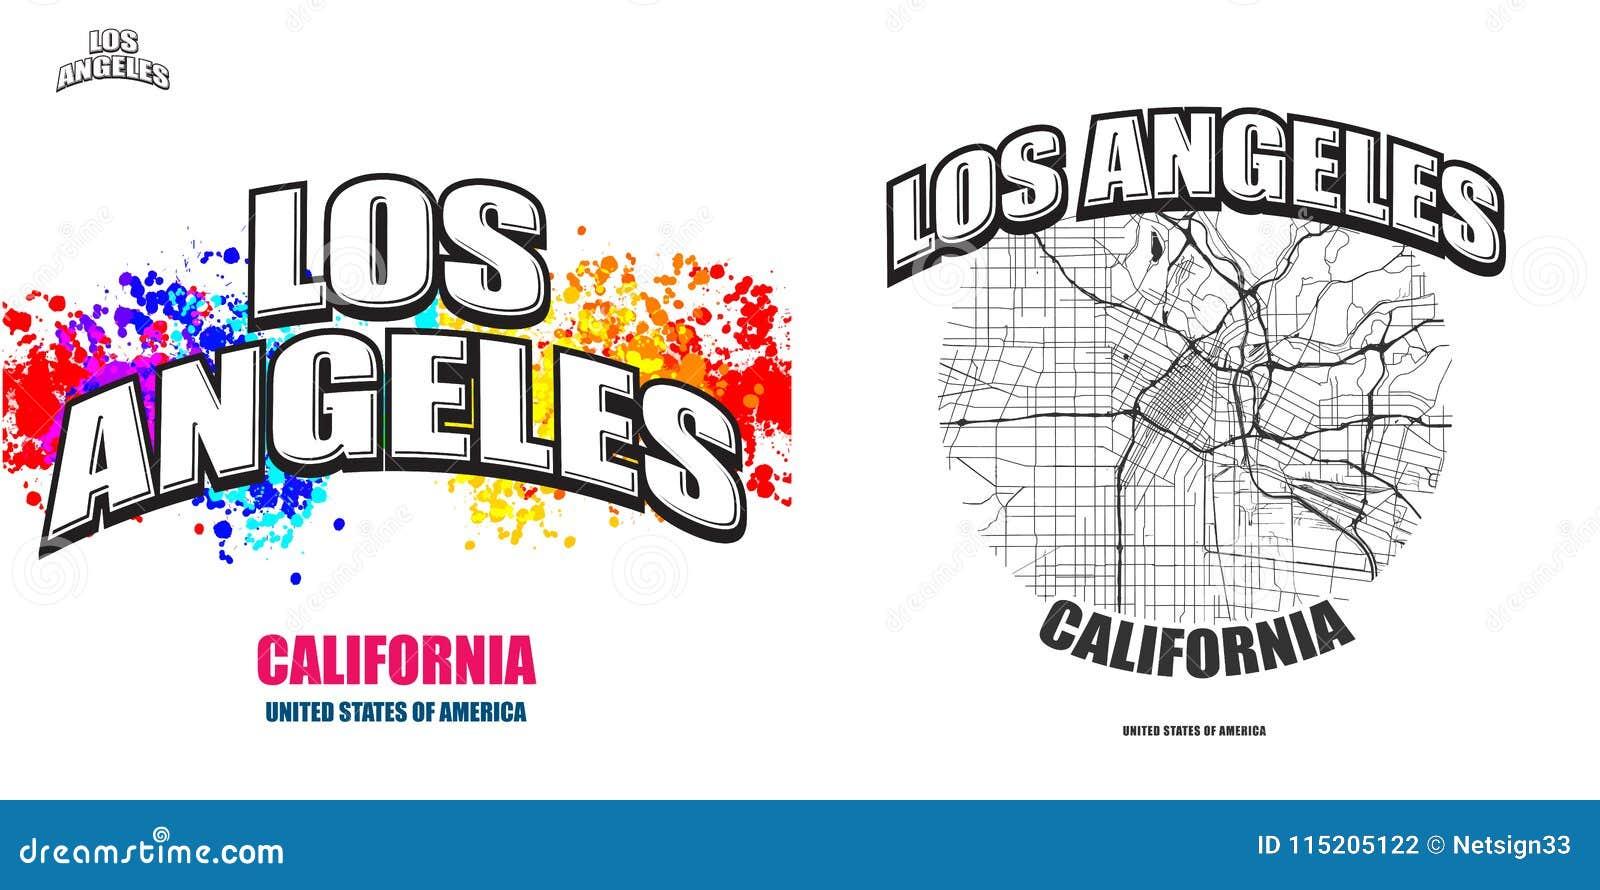 Los Angeles California Two Logo Artworks Stock Vector Illustration Of Shirt Illustration 115205122,Clash Of Clans Builder Hall 4 Base Design